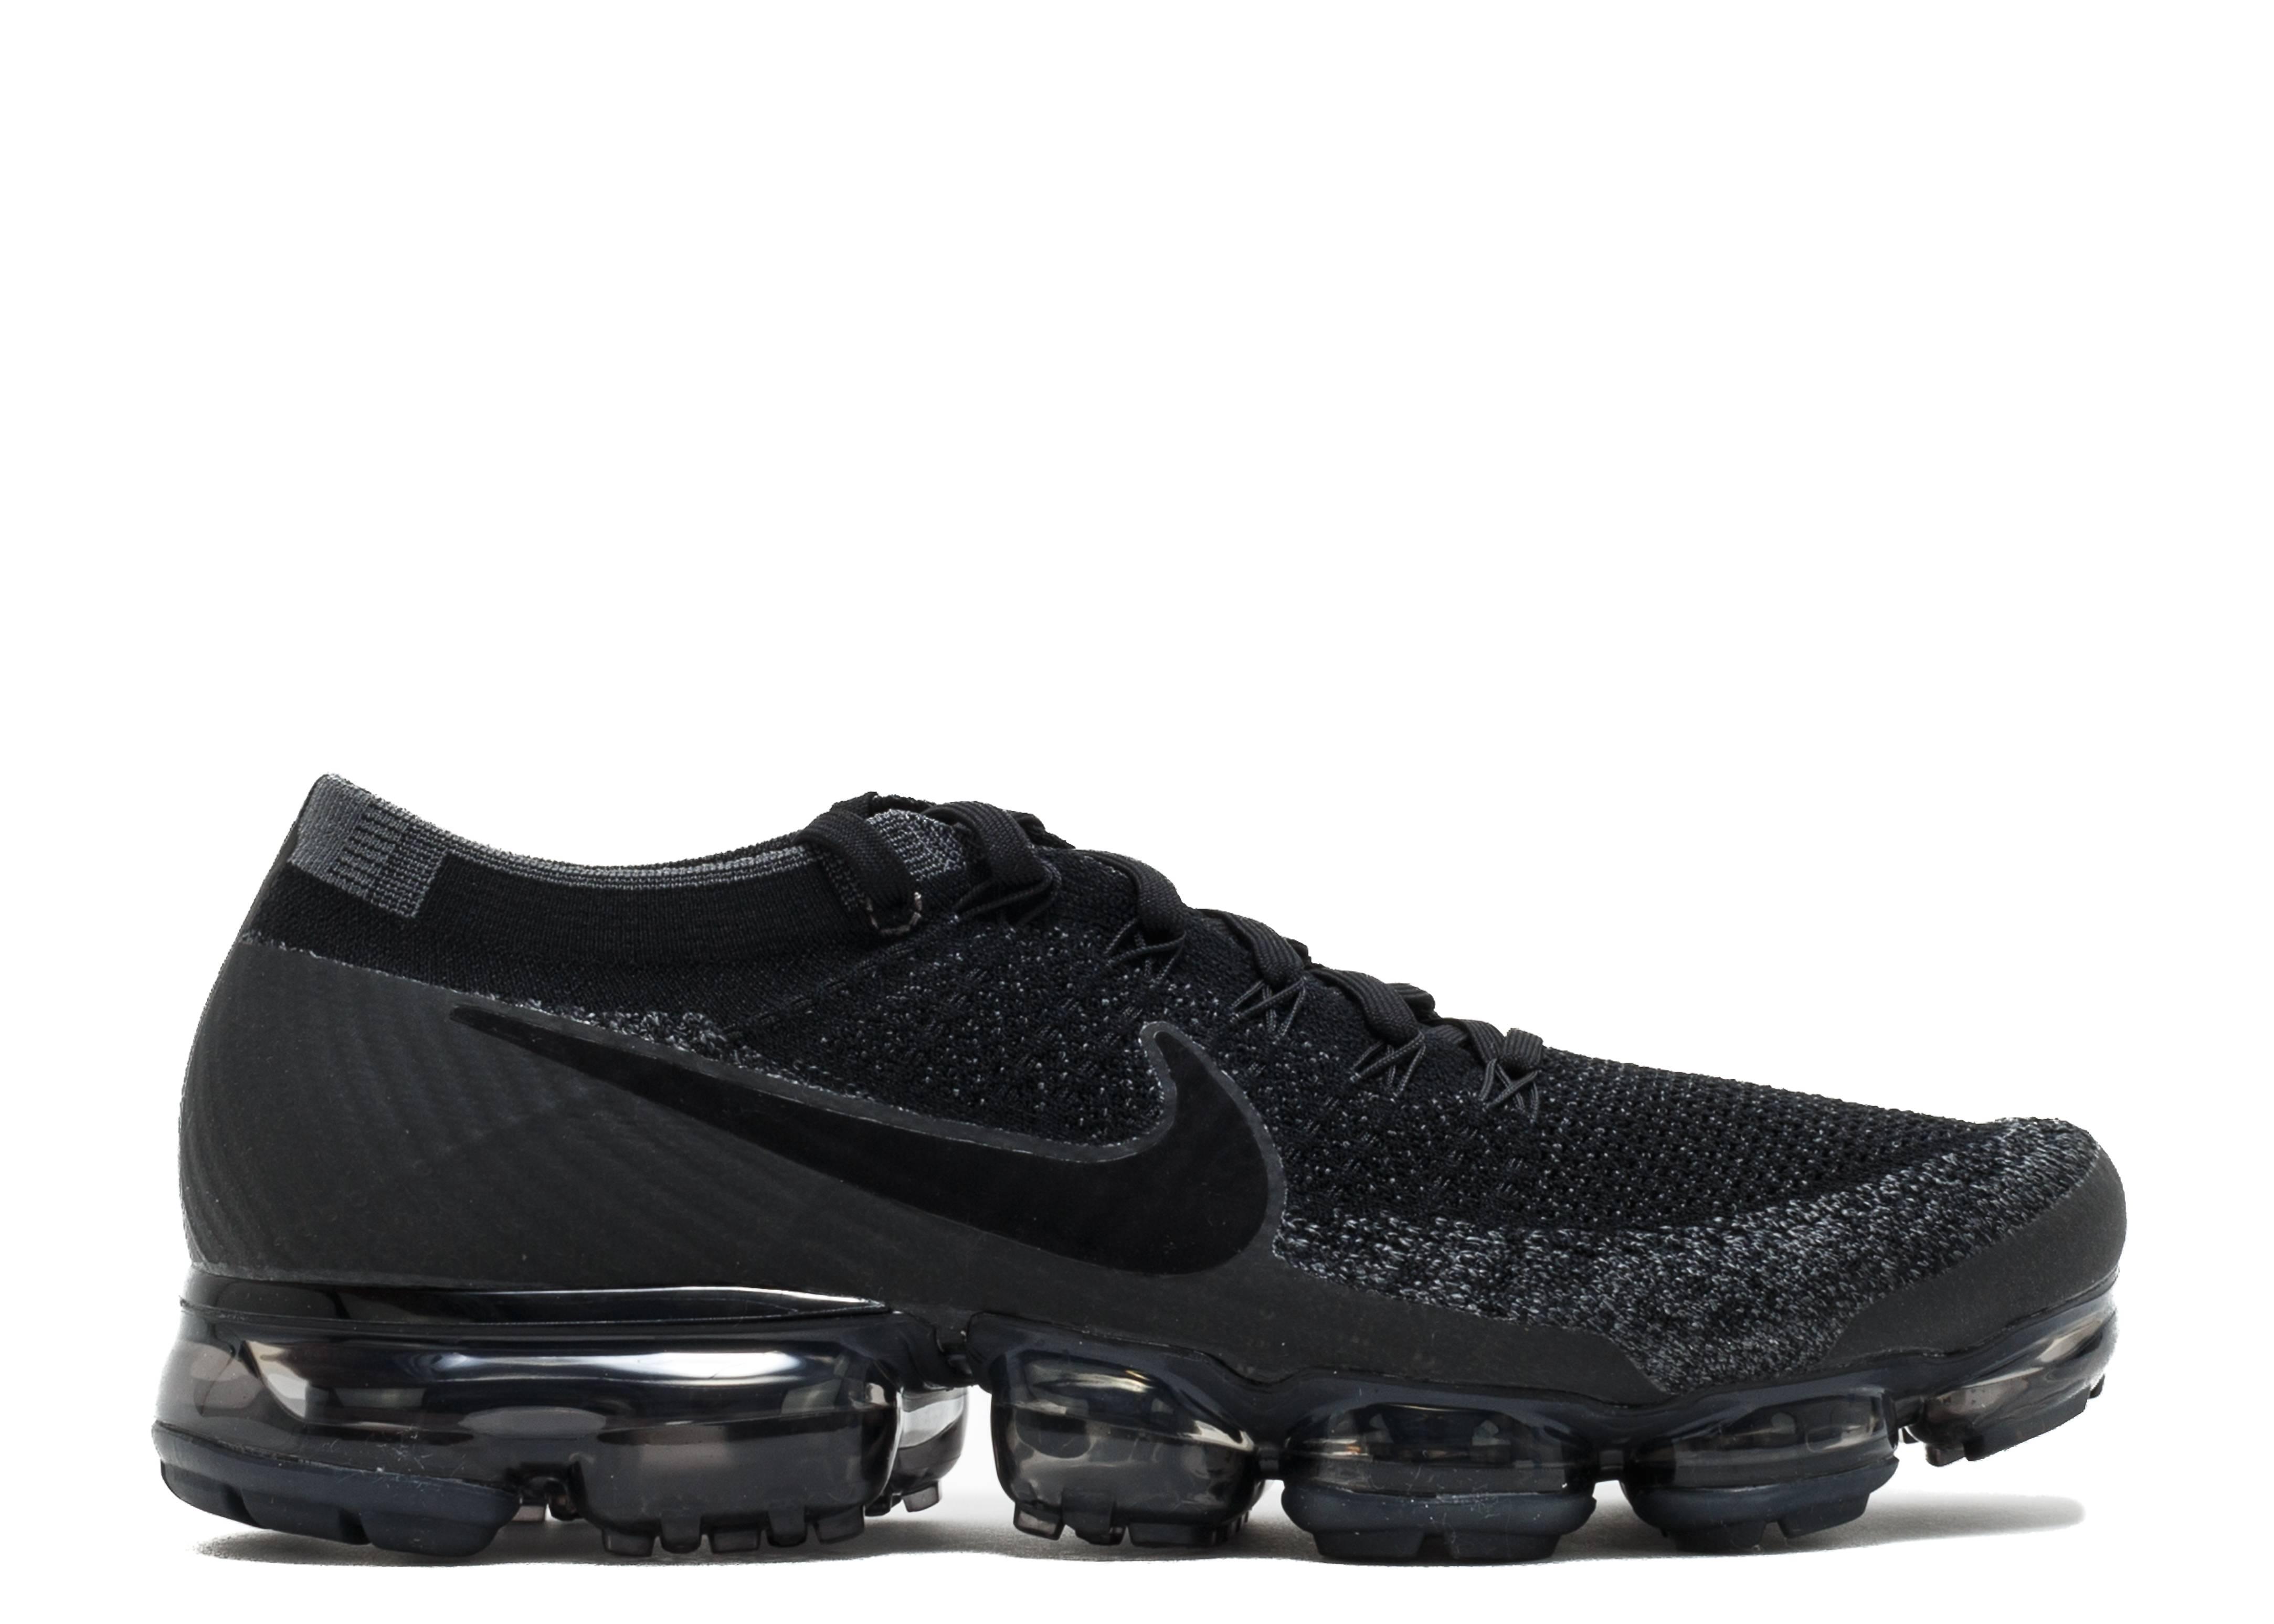 Nike Air Vapormax Asphalt Grey